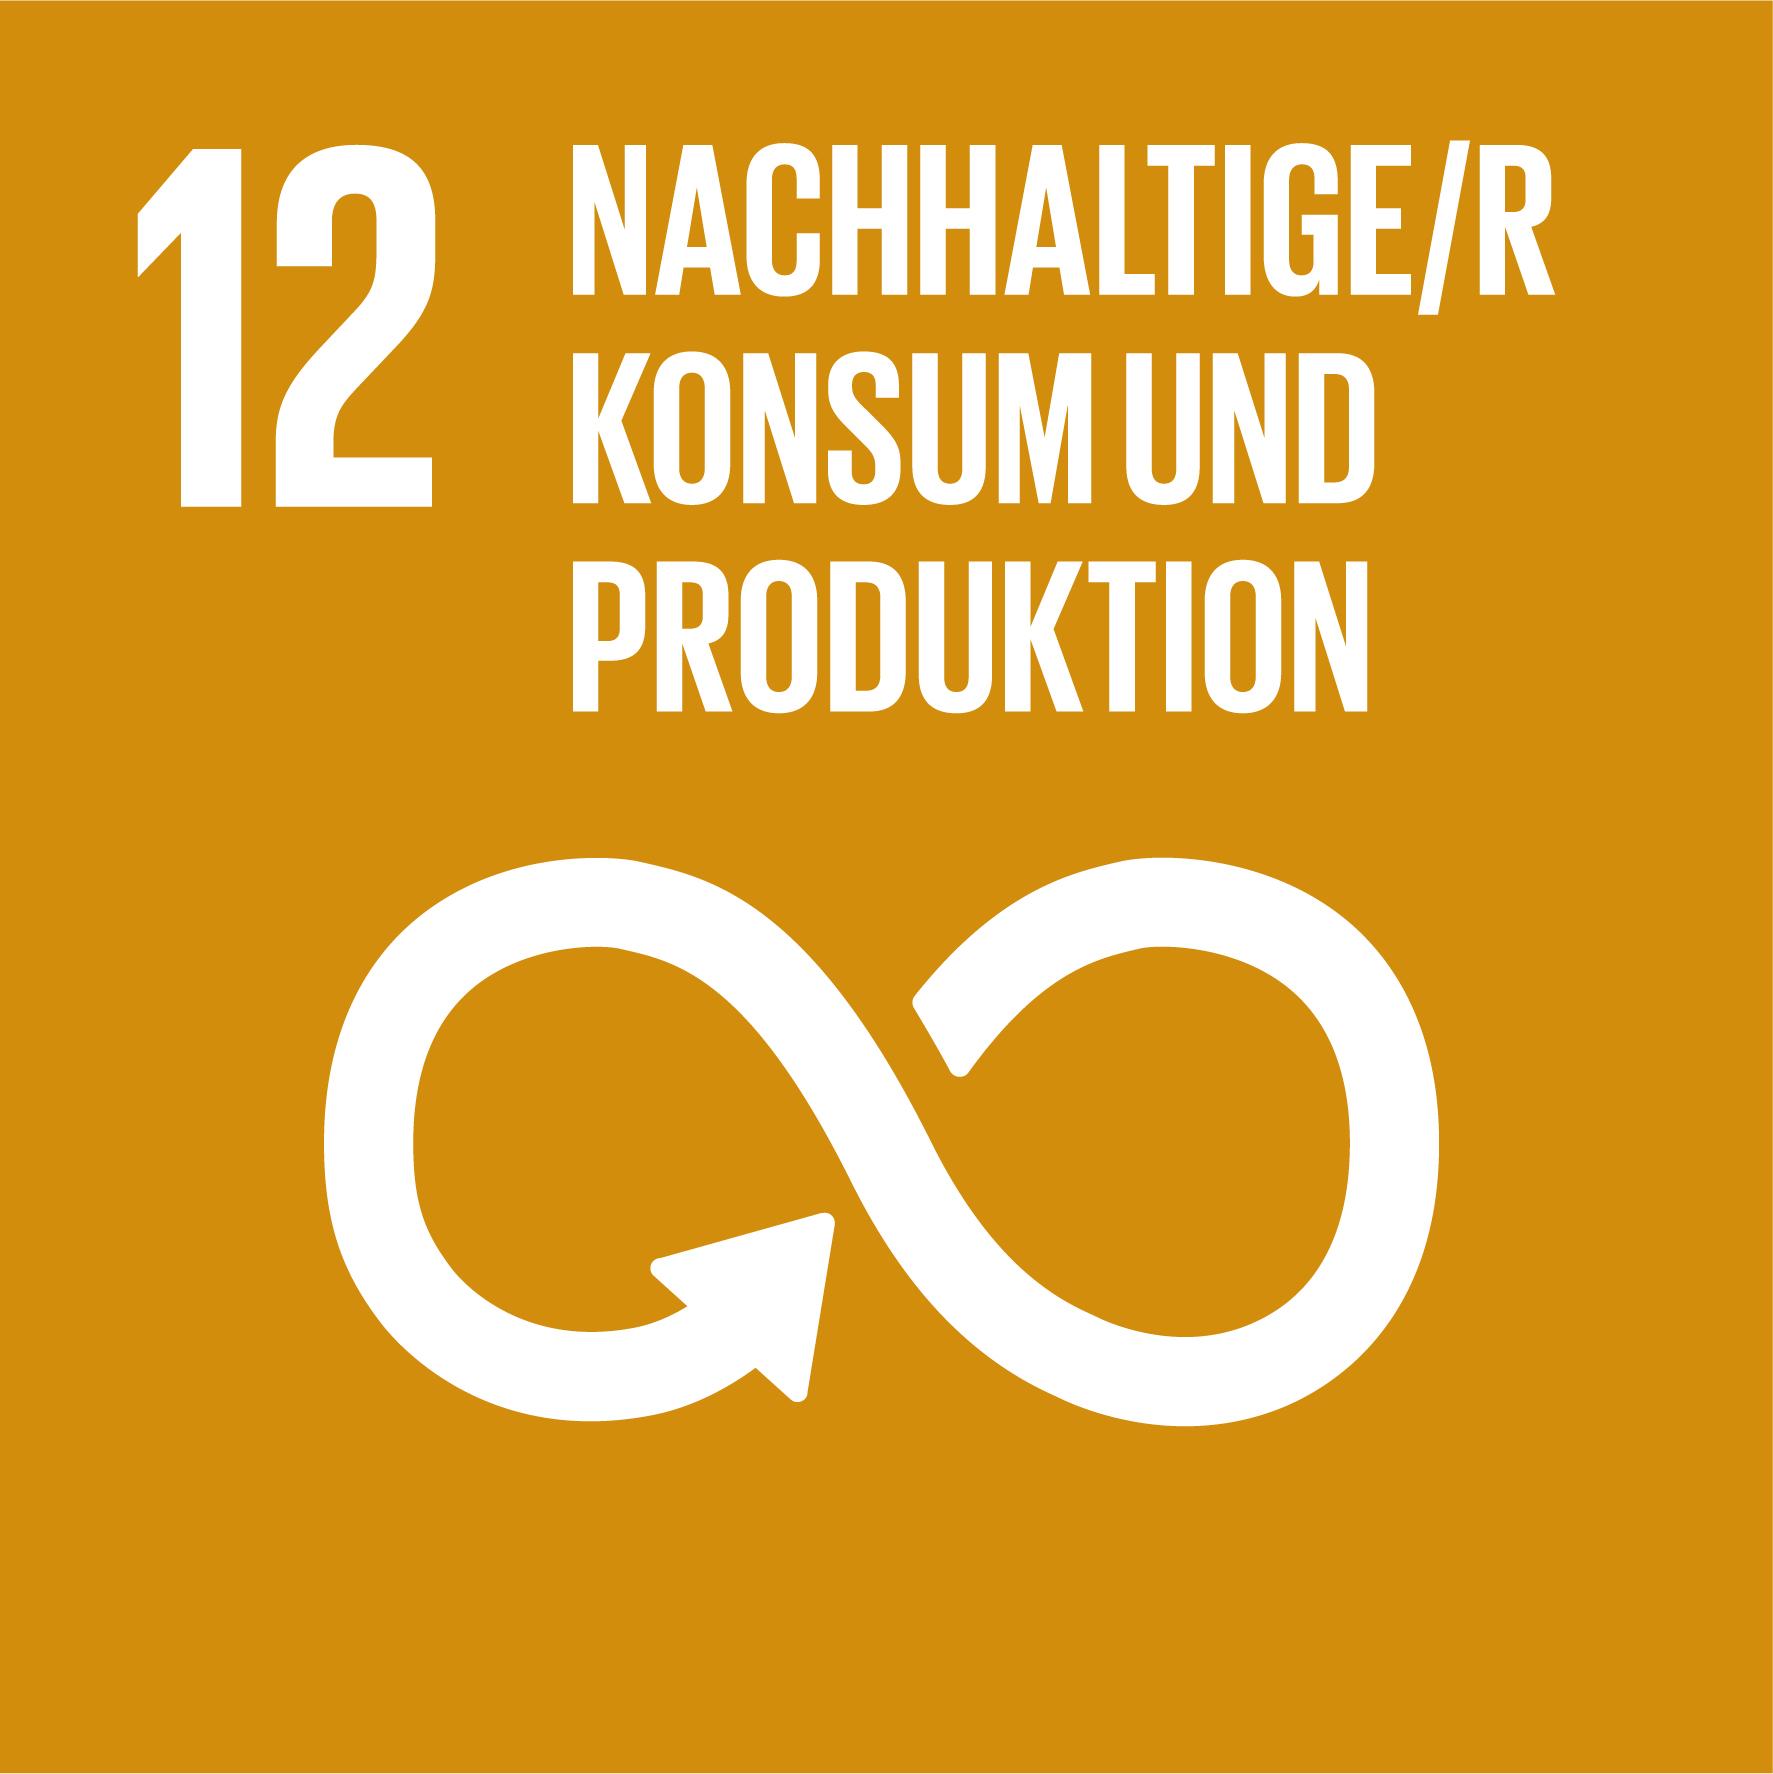 Regensburger Nachhaltigkeitswoche - SDG 12